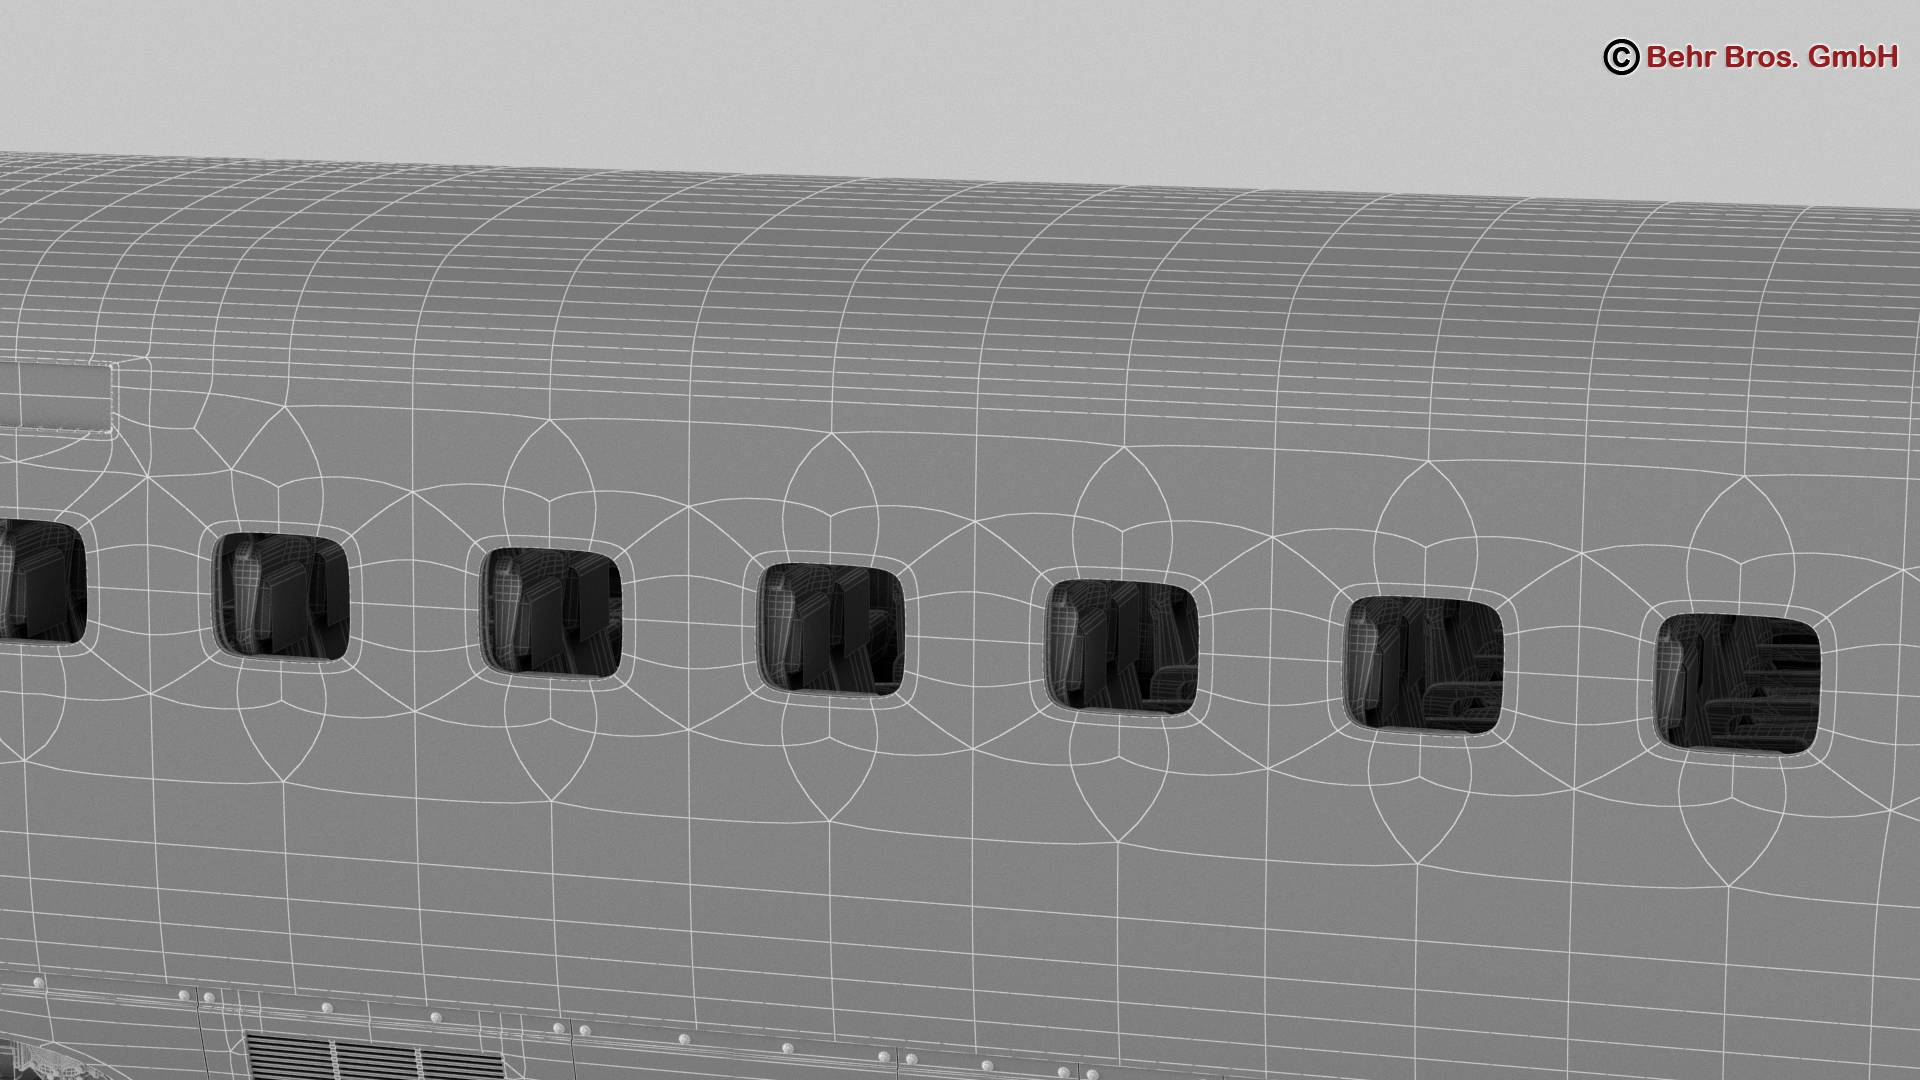 shinkansen e7 3d model 3ds max fbx c4d lwo ma mb obj 265679